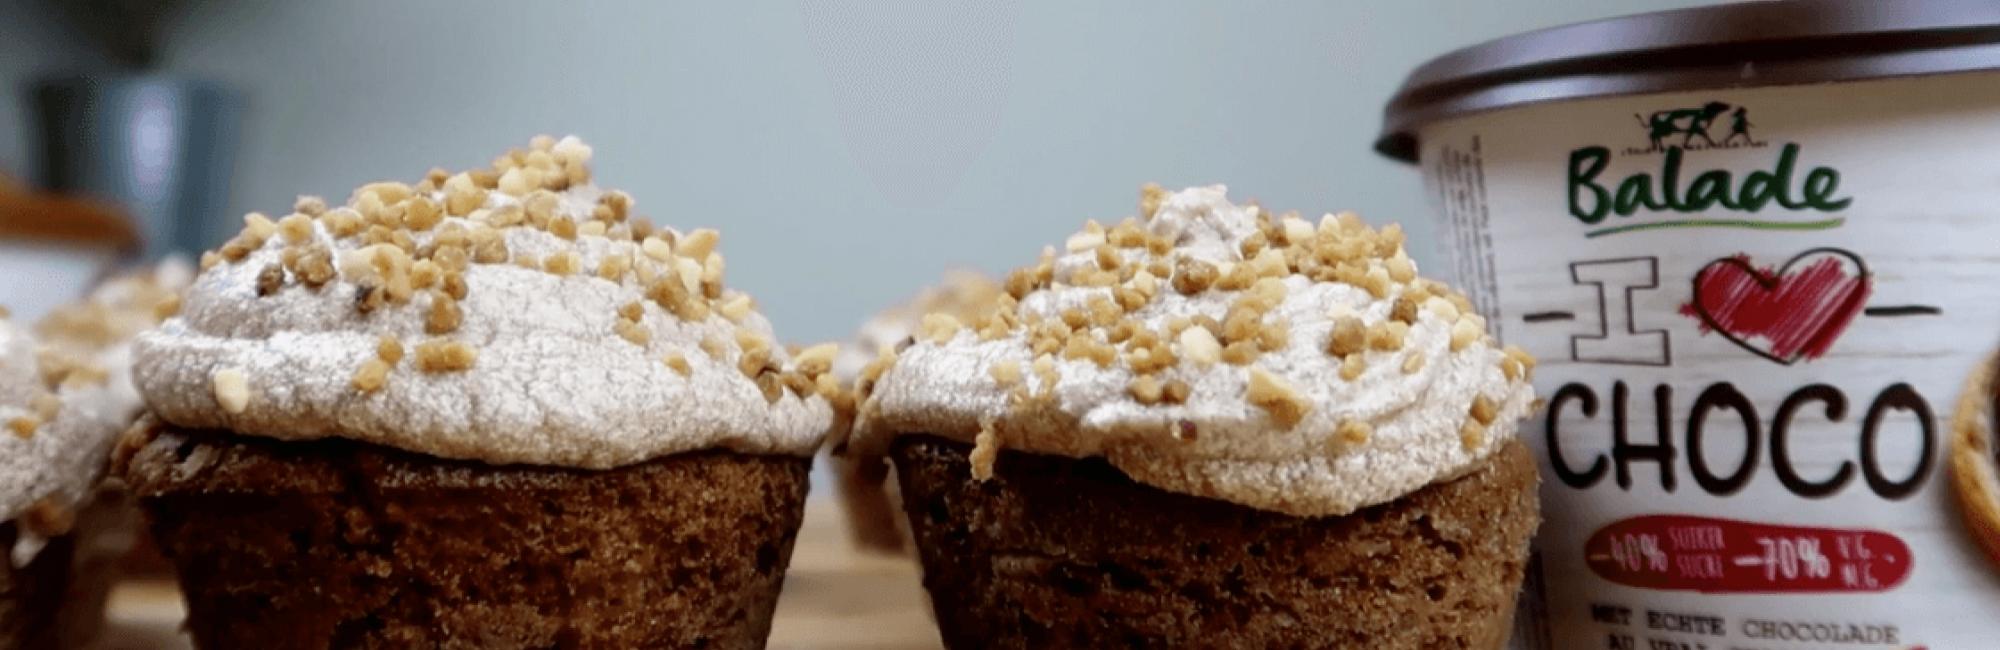 cupcakes, chocolade, chocopasta, glazuur